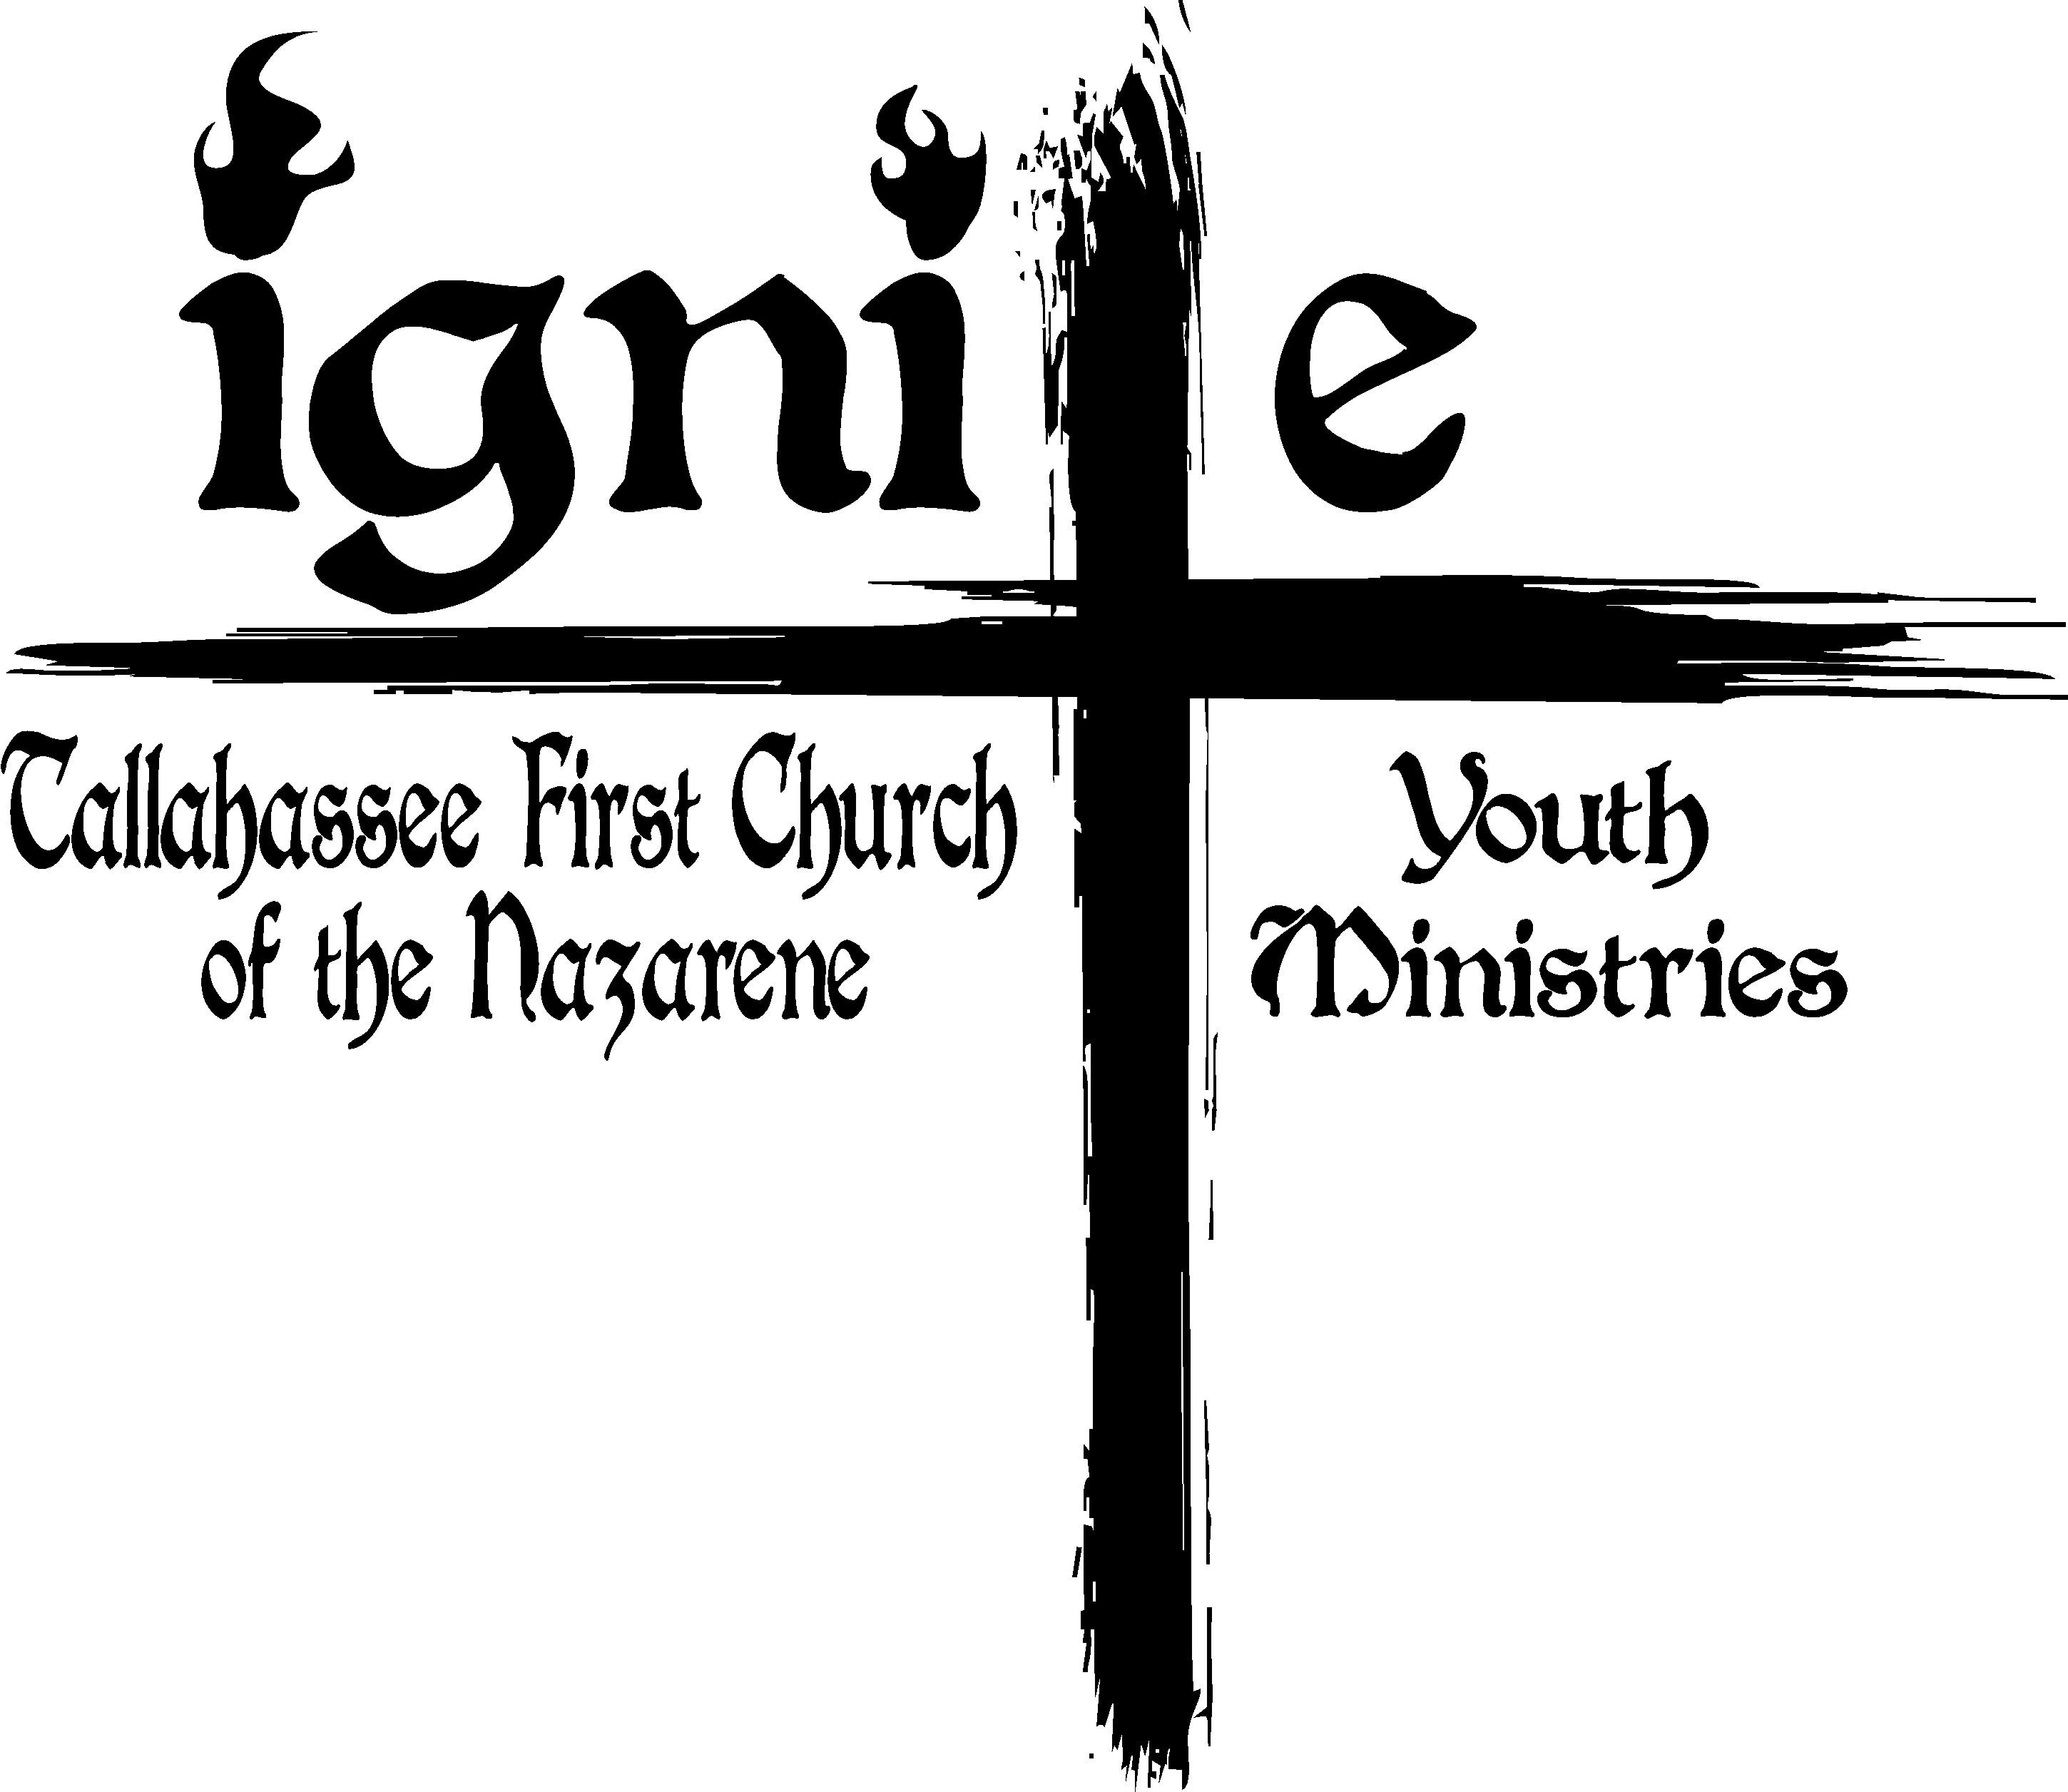 Ignite-front.jpg